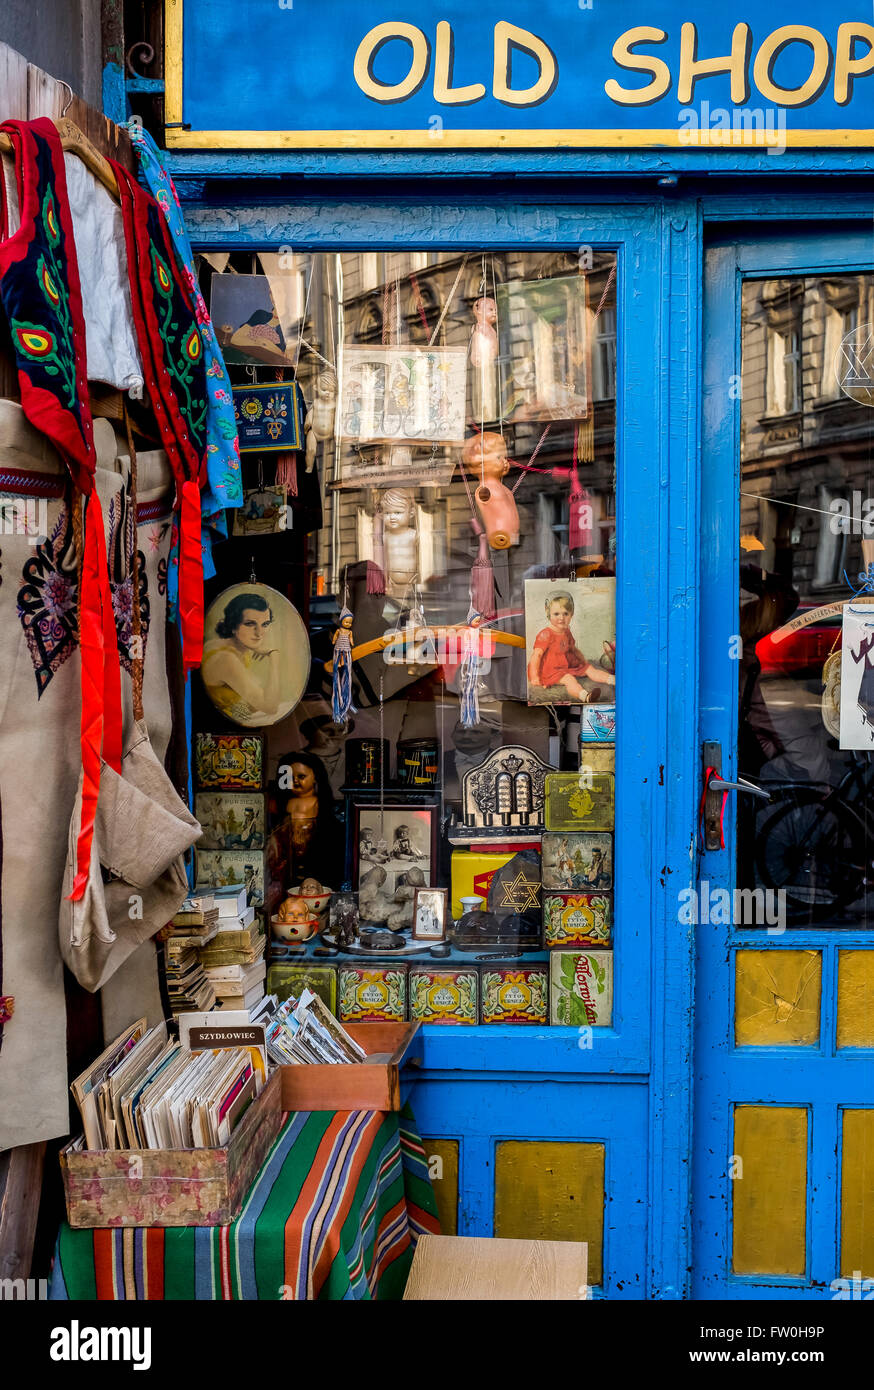 Curiosity Shop front window full of antiques and memorabilia in Jewish Quarter, Krakow, Lesser Poland - Stock Image